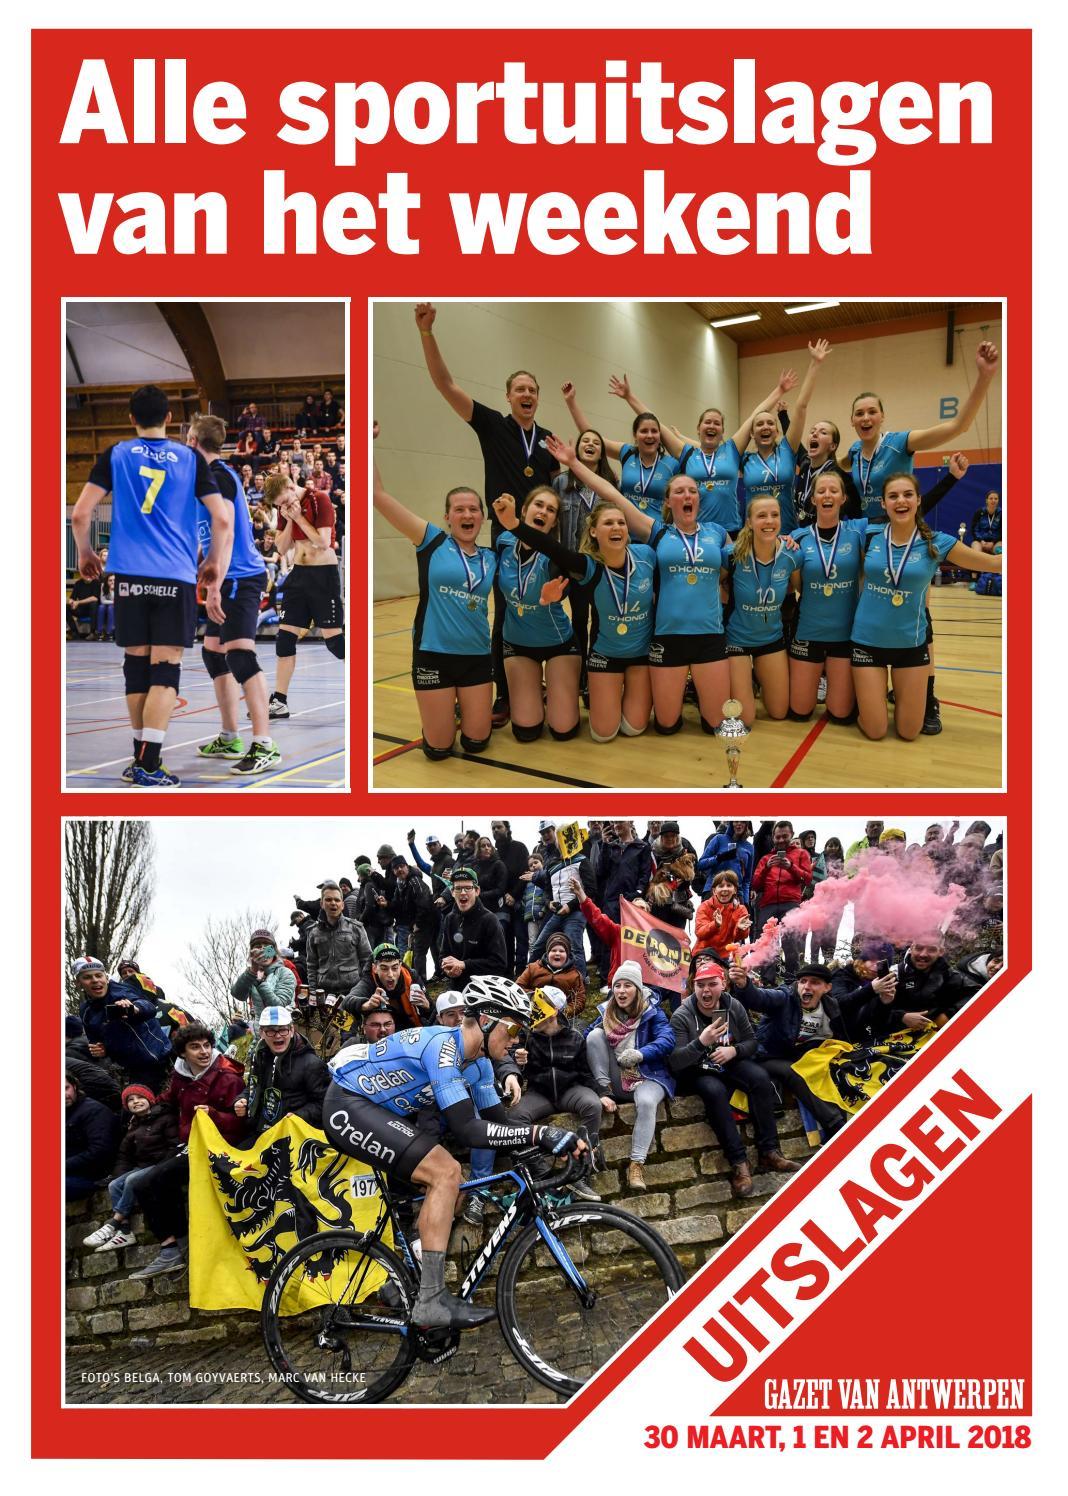 b325badee65 Sportuitslagen 2018-04-02 by Gazet Van Antwerpen - issuu